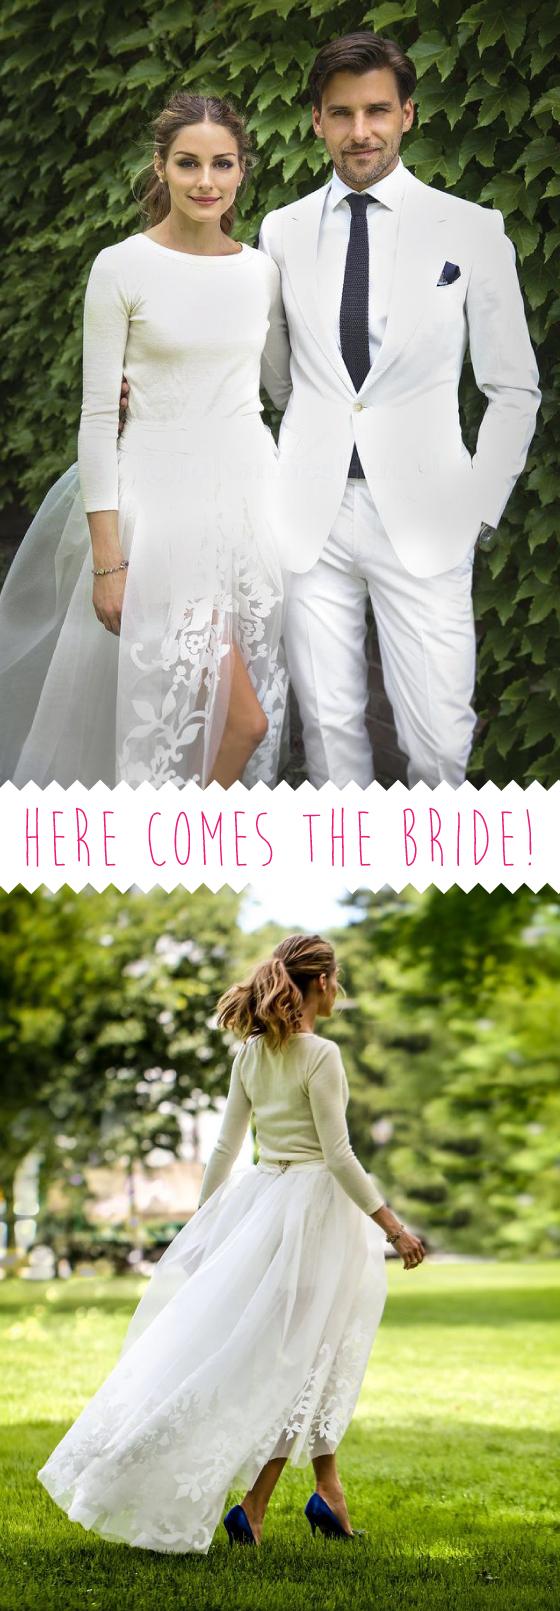 olivia-palermo-noiva-bride-Johannes-Huebl-casamento-wedding-dress-vestido-look-carolina-herrera-sapato-azul-manolo-blahnik-blue-shoes-fotos